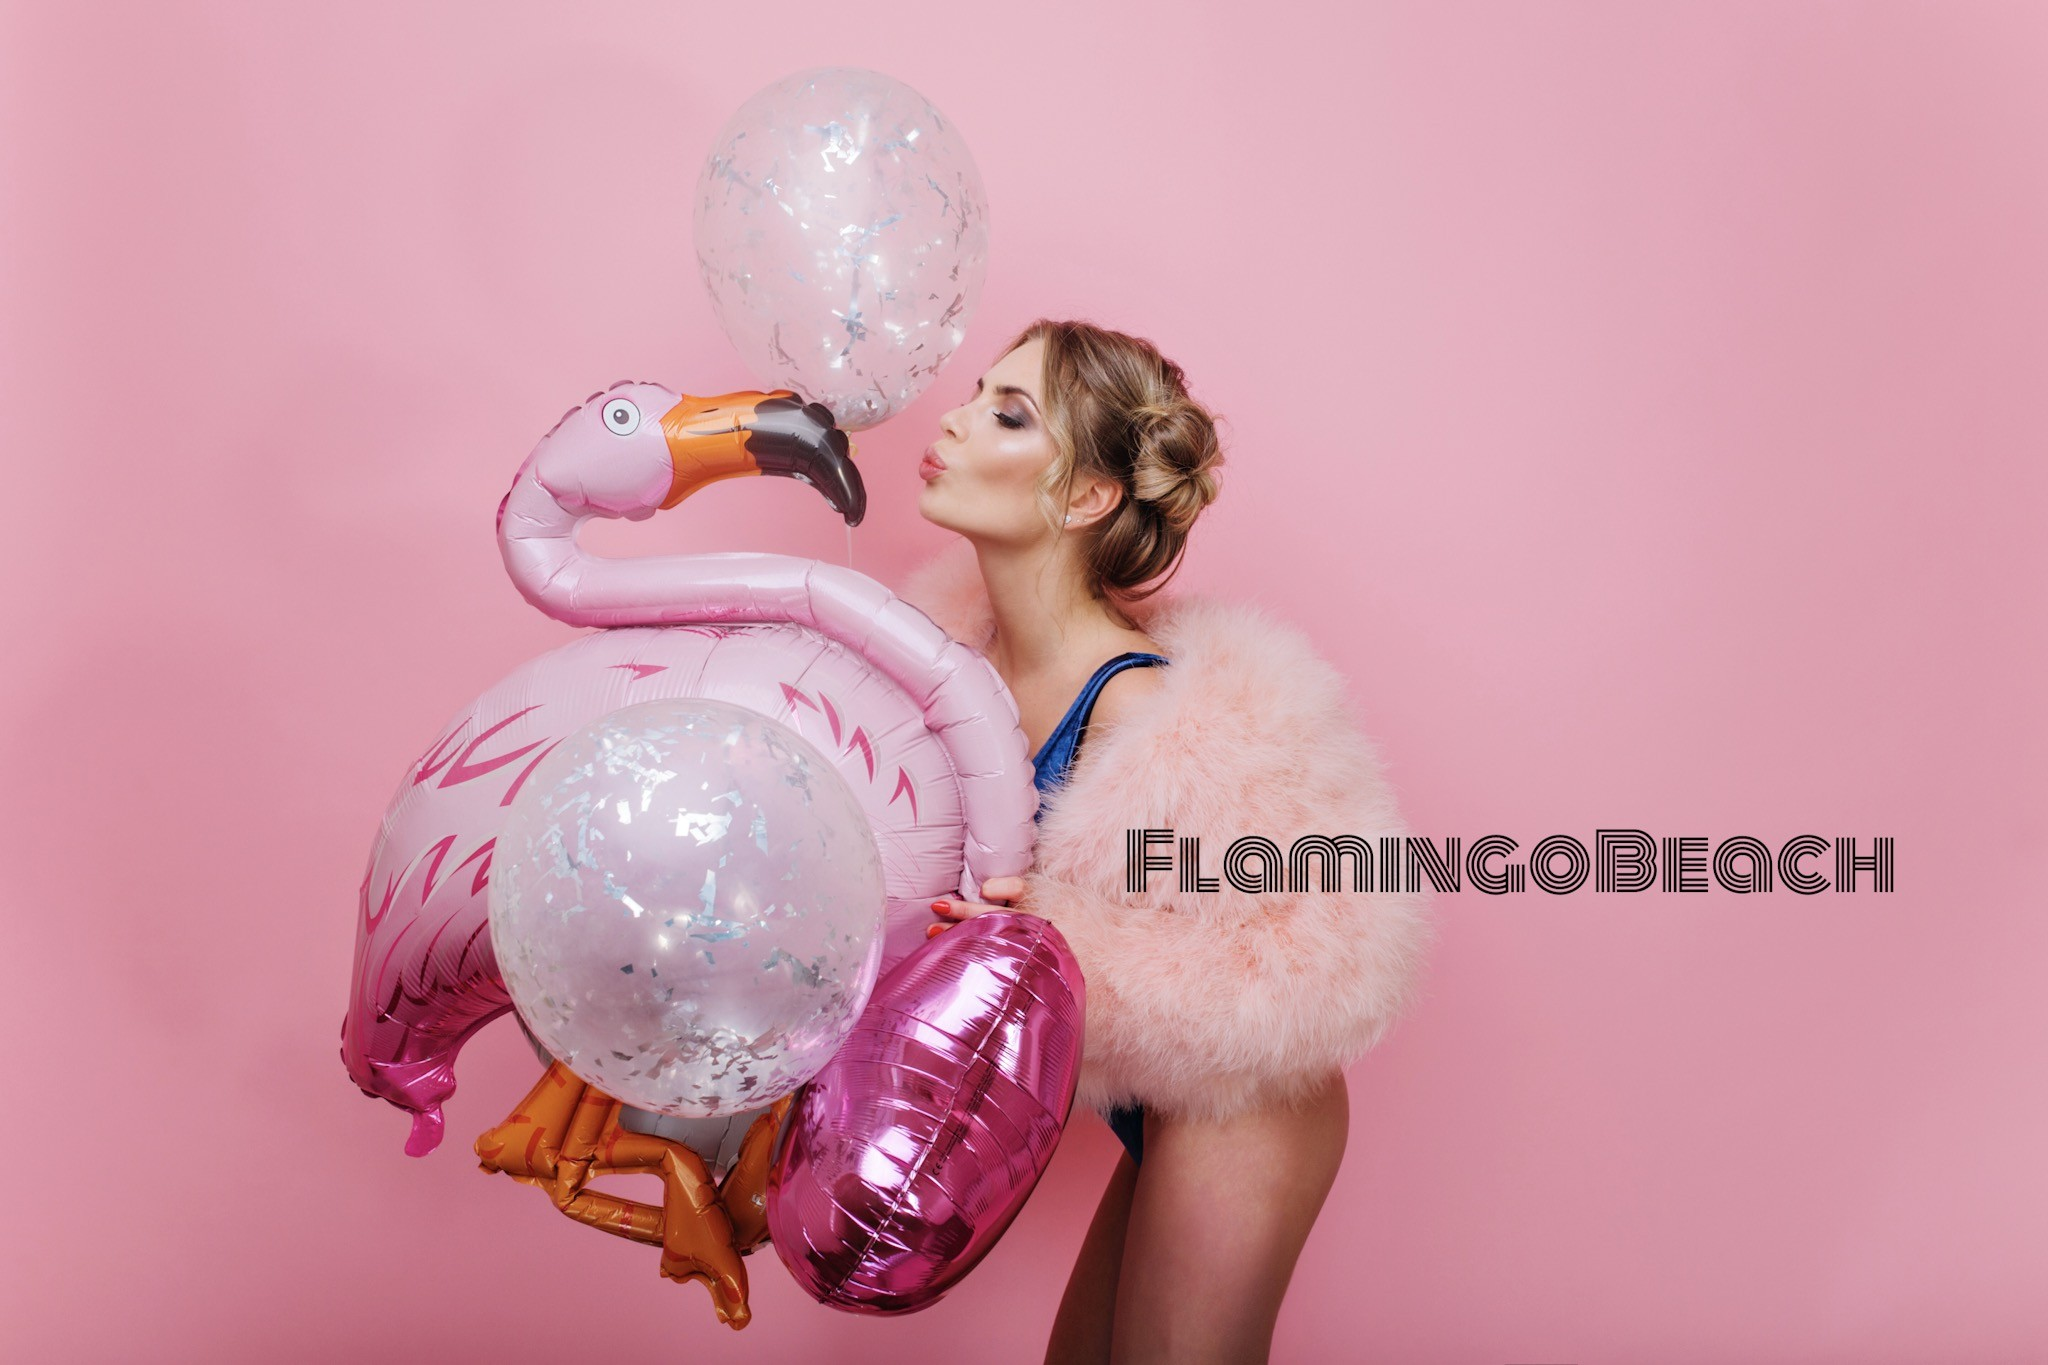 【FlamingoBeach】 ビキニ 4000種類以上 !日本最大級